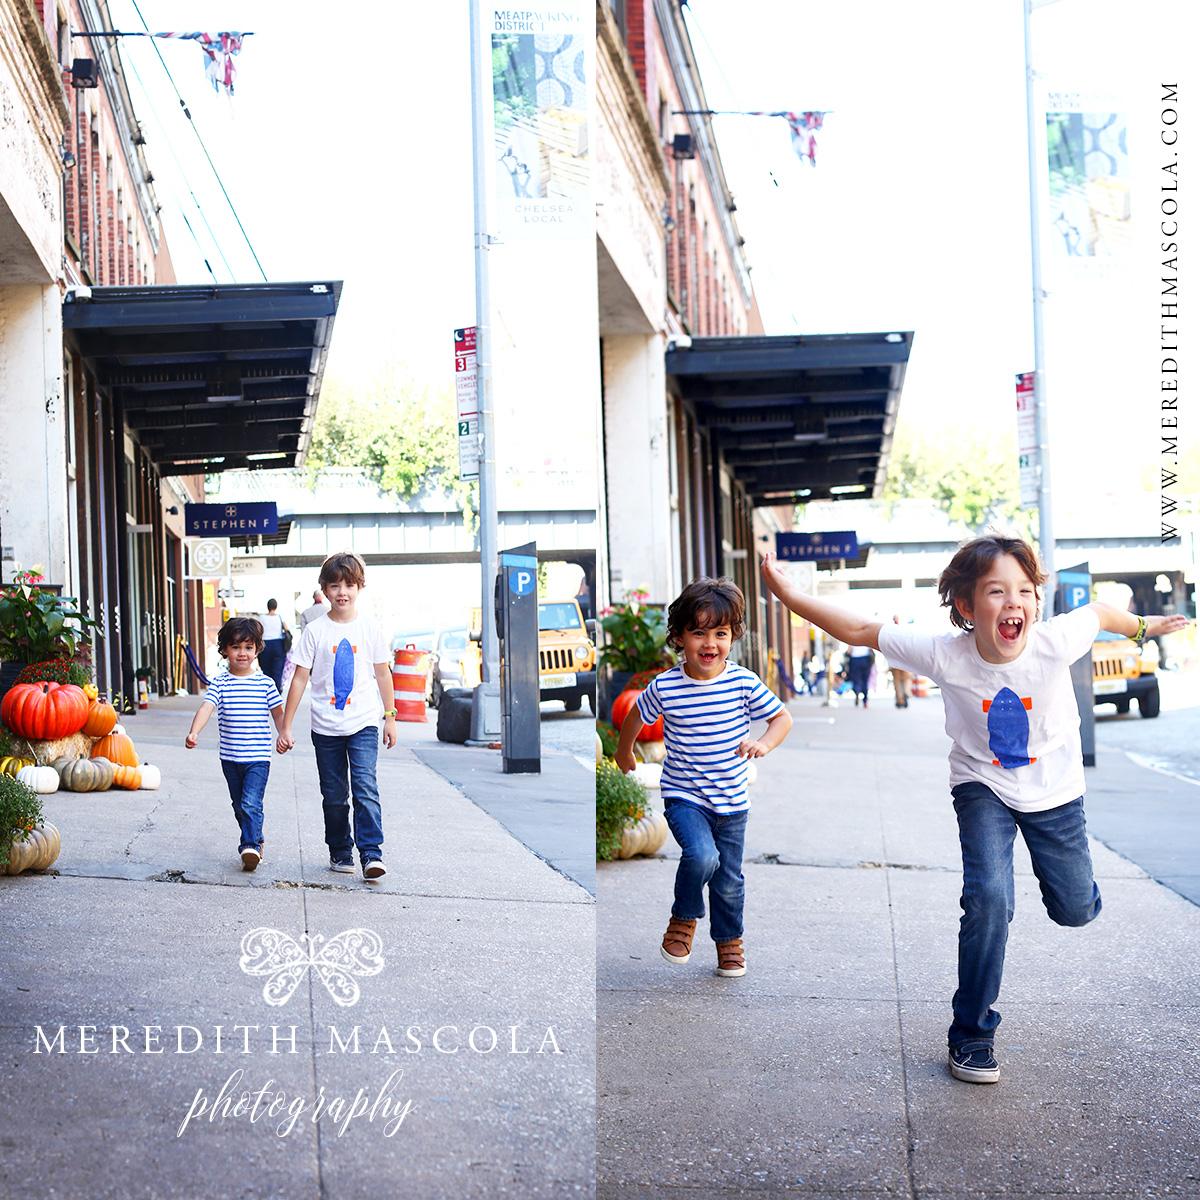 manhattanfamilyphotographer14.jpg